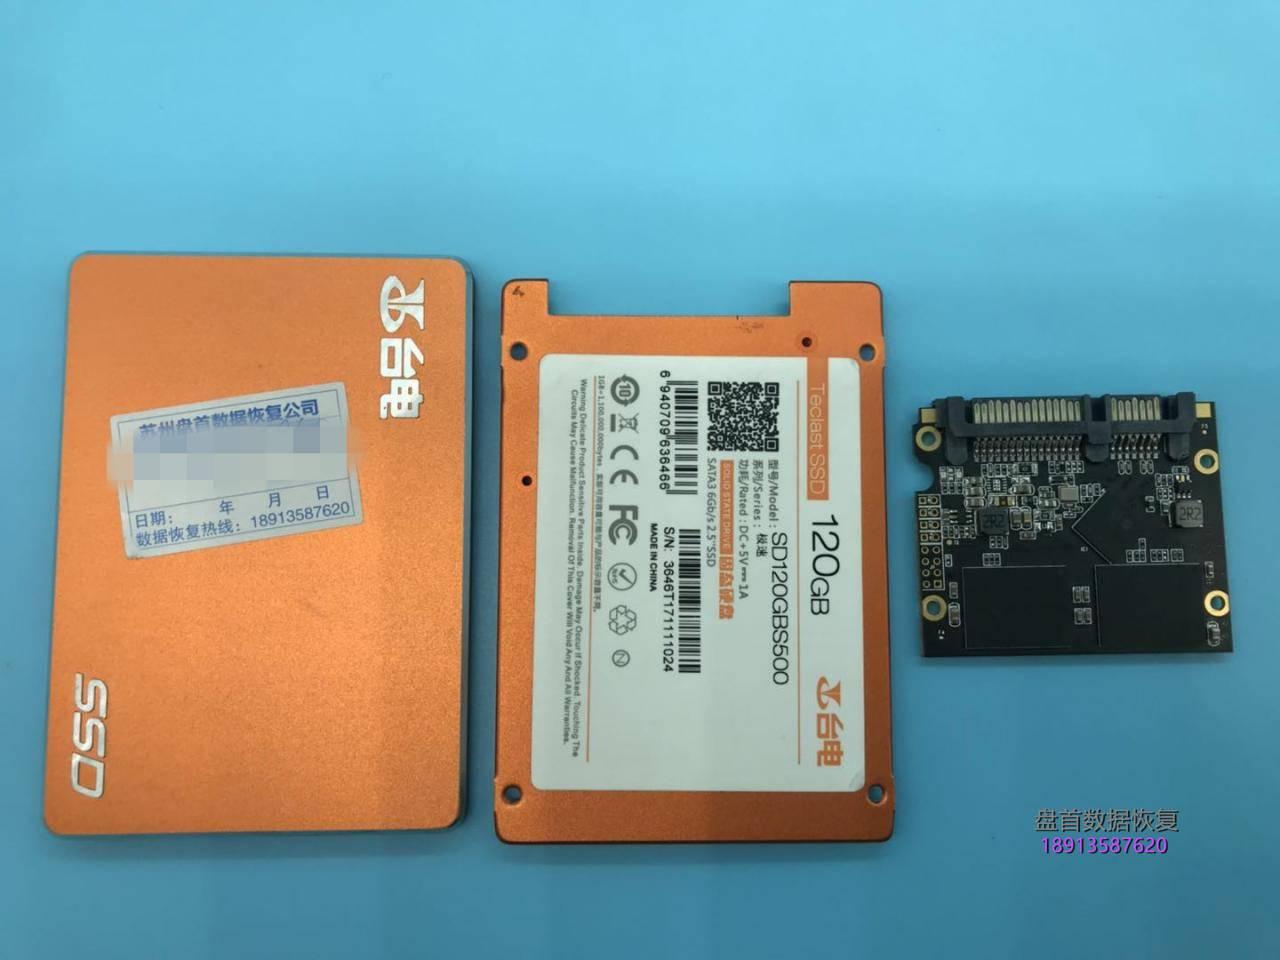 s500台电120g固态硬盘sm2246xt主控掉盘无法识别不读盘数据恢 S500台电120G固态硬盘SM2246XT主控掉盘无法识别不读盘数据恢复成功